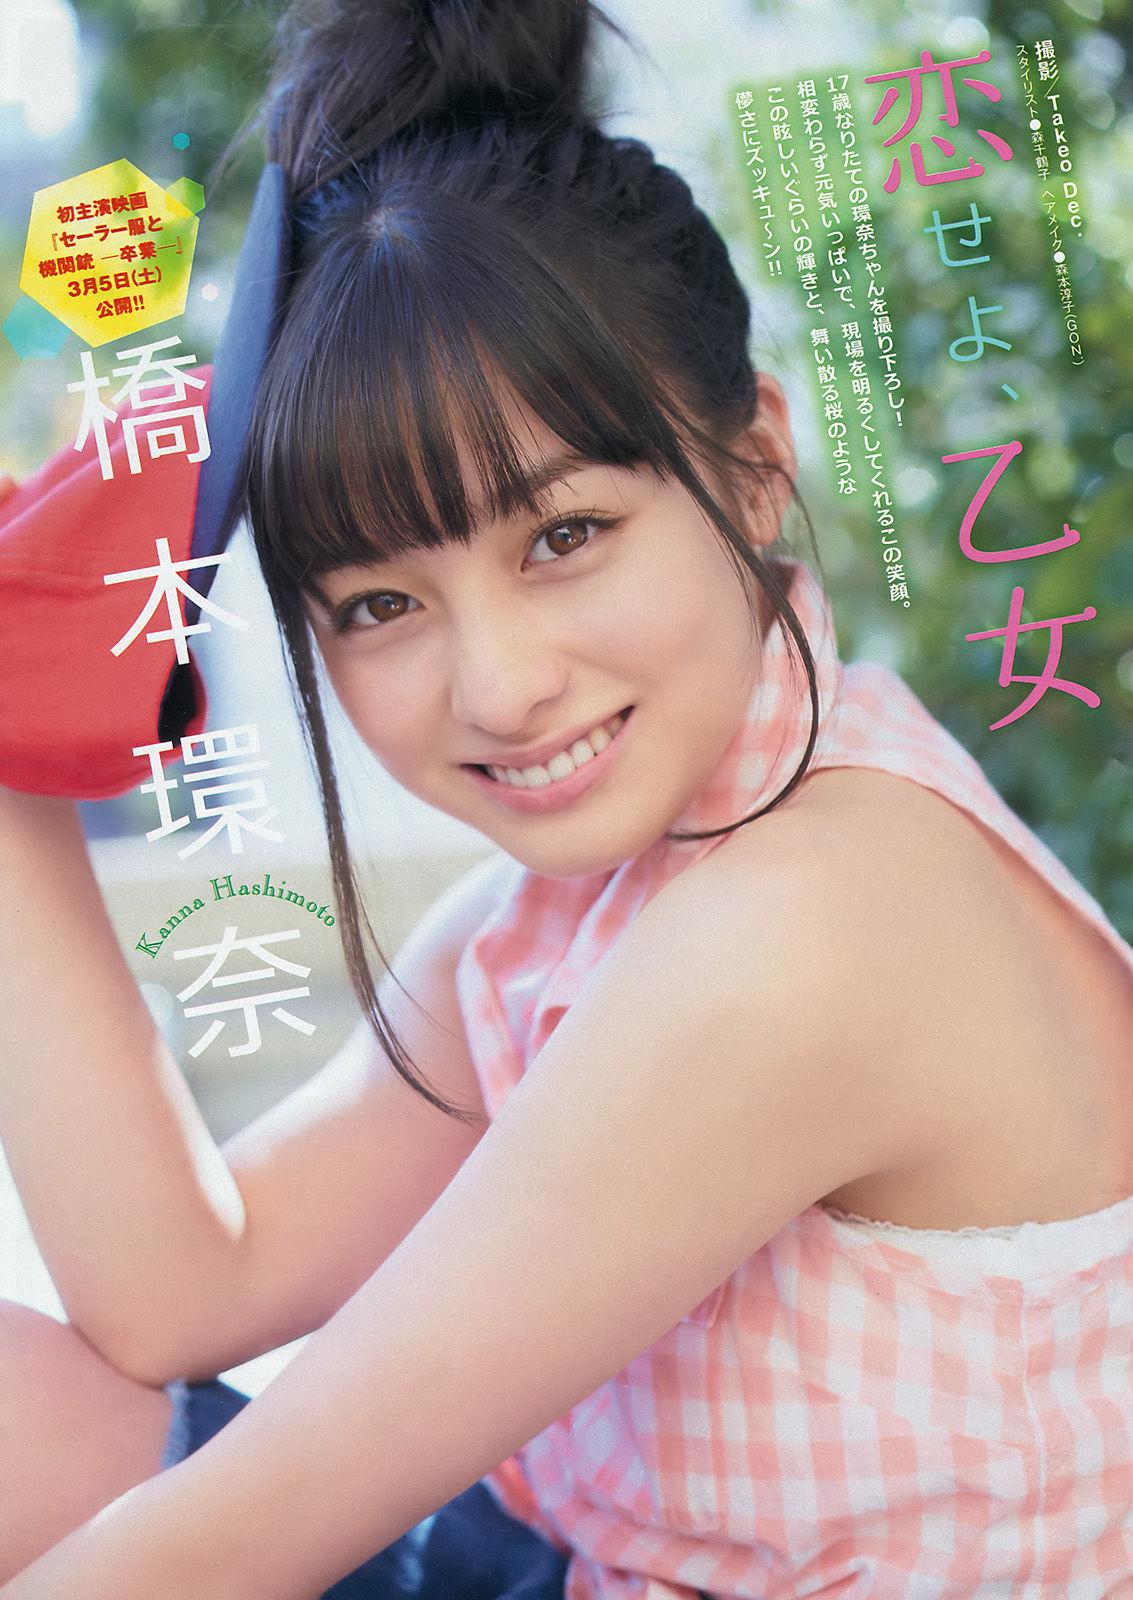 VOL.503 [Young Magazine]日本少女:桥本环奈超高清写真套图(11P)